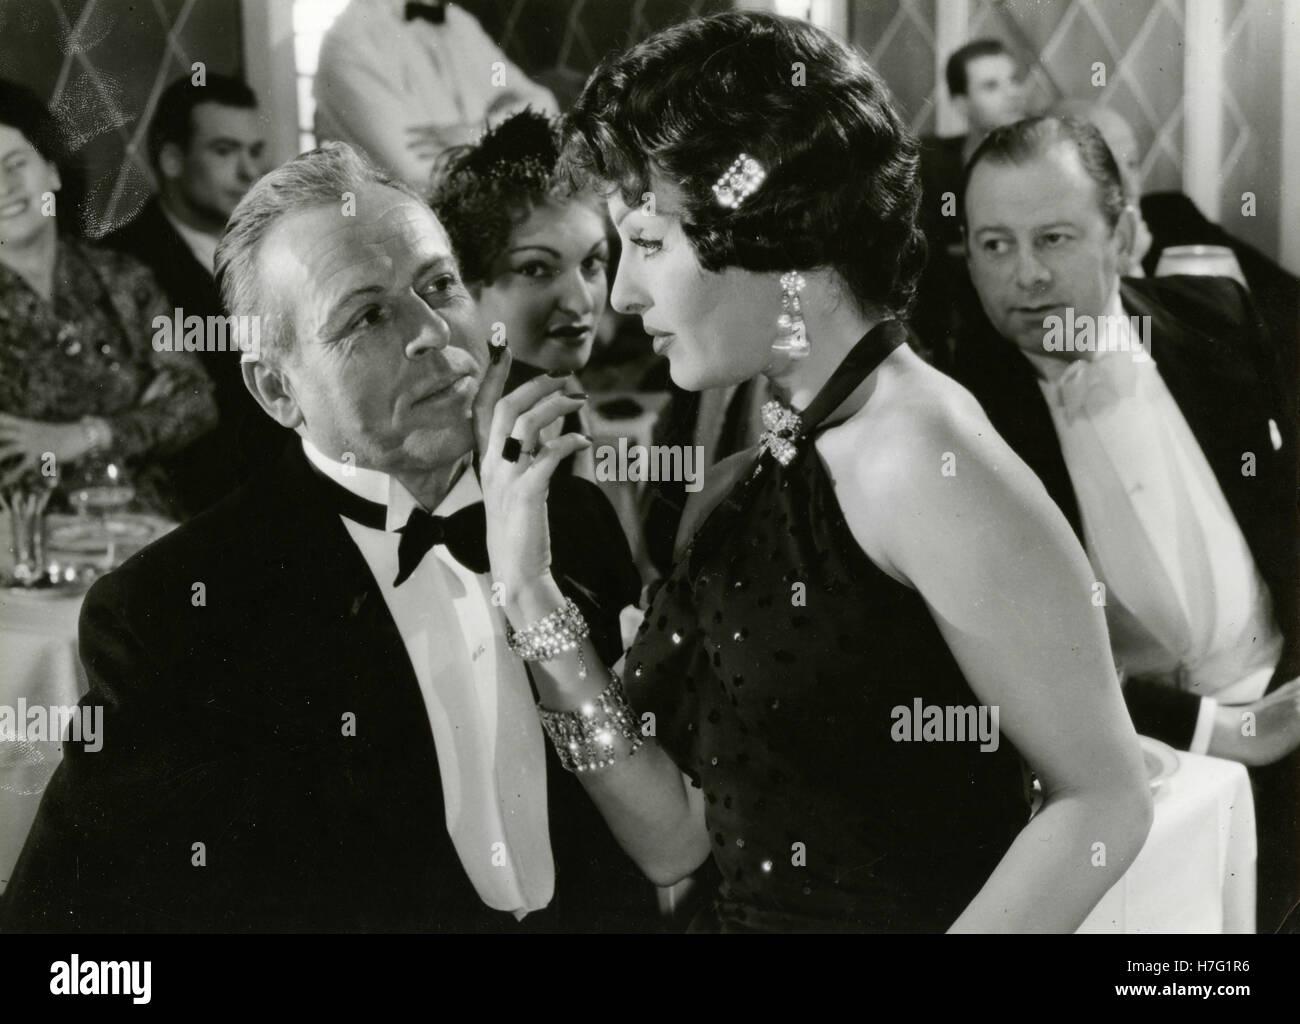 Actress Silvana Pampanini in the movie La Loi des Rues, France 1956 - Stock Image